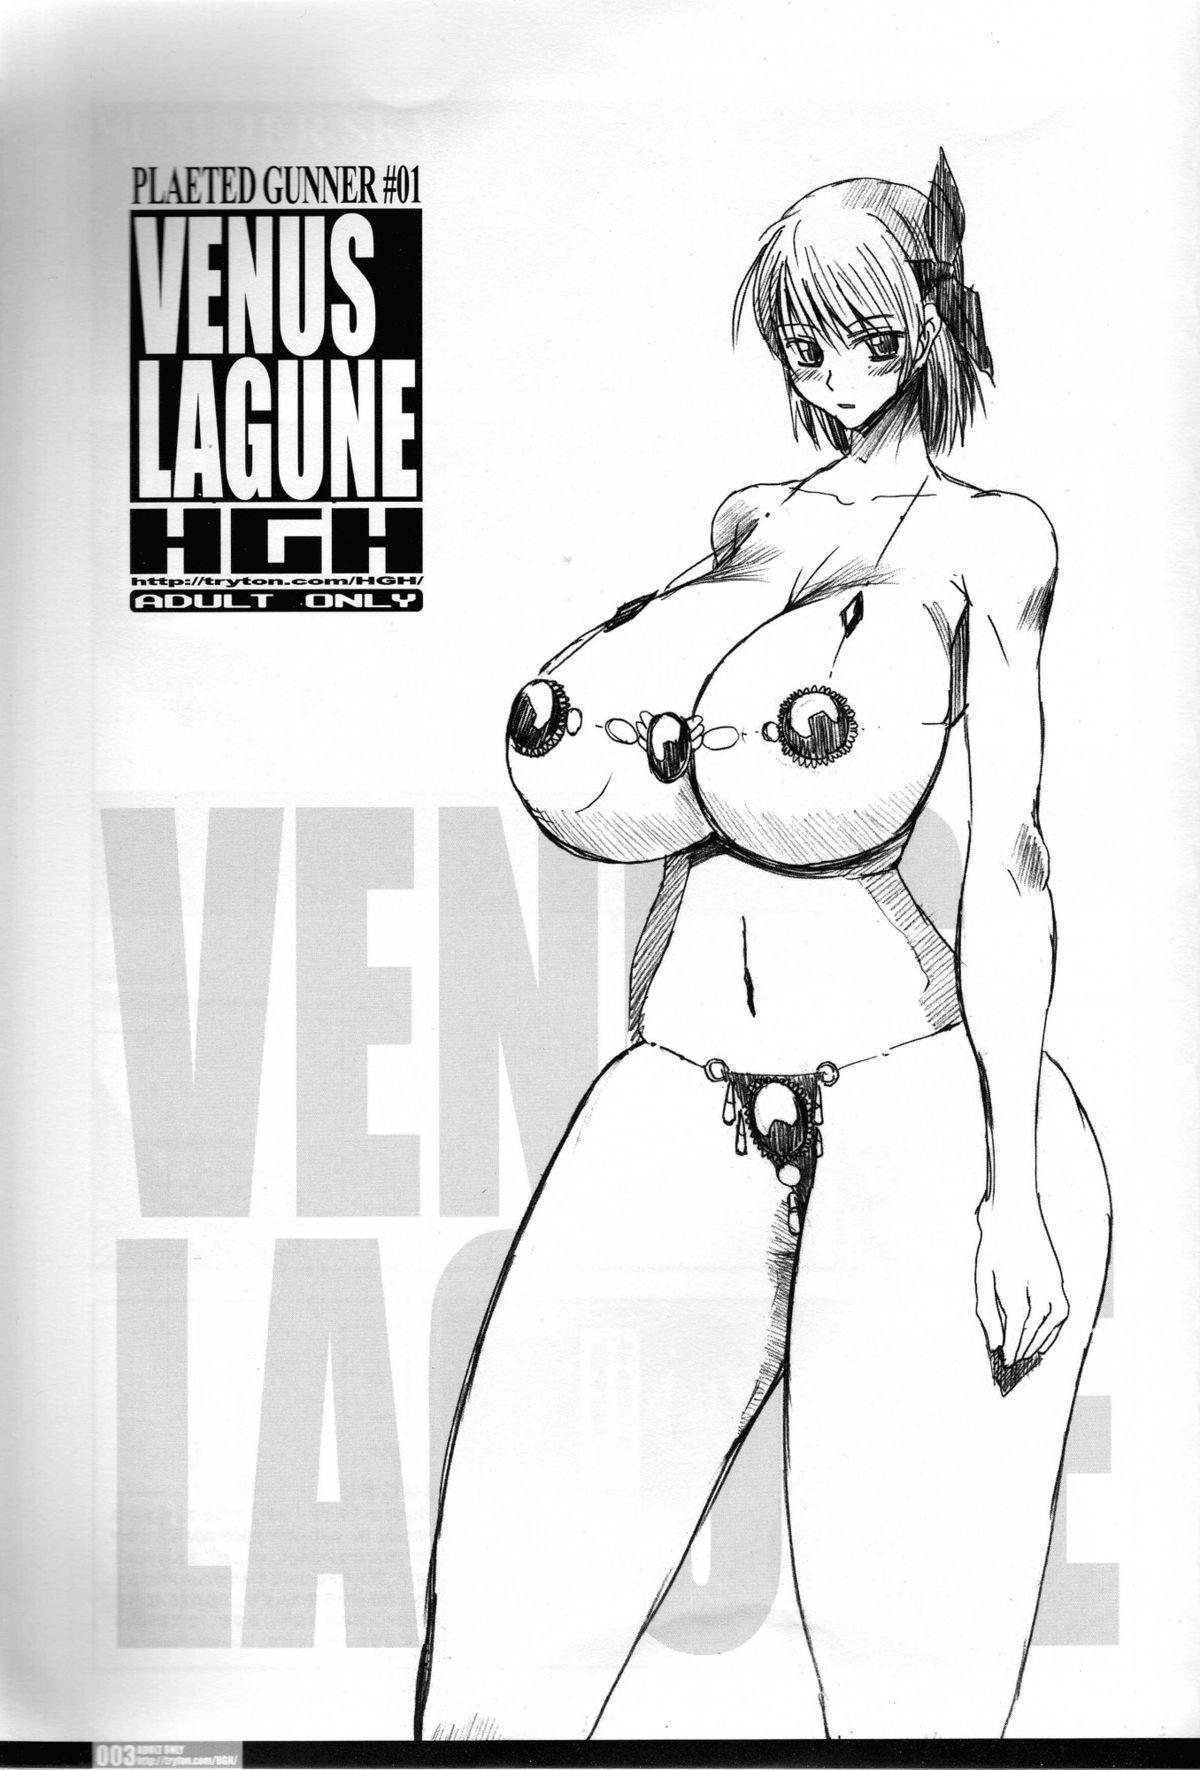 Pleated Gunner #01 - Venus Lagune 1